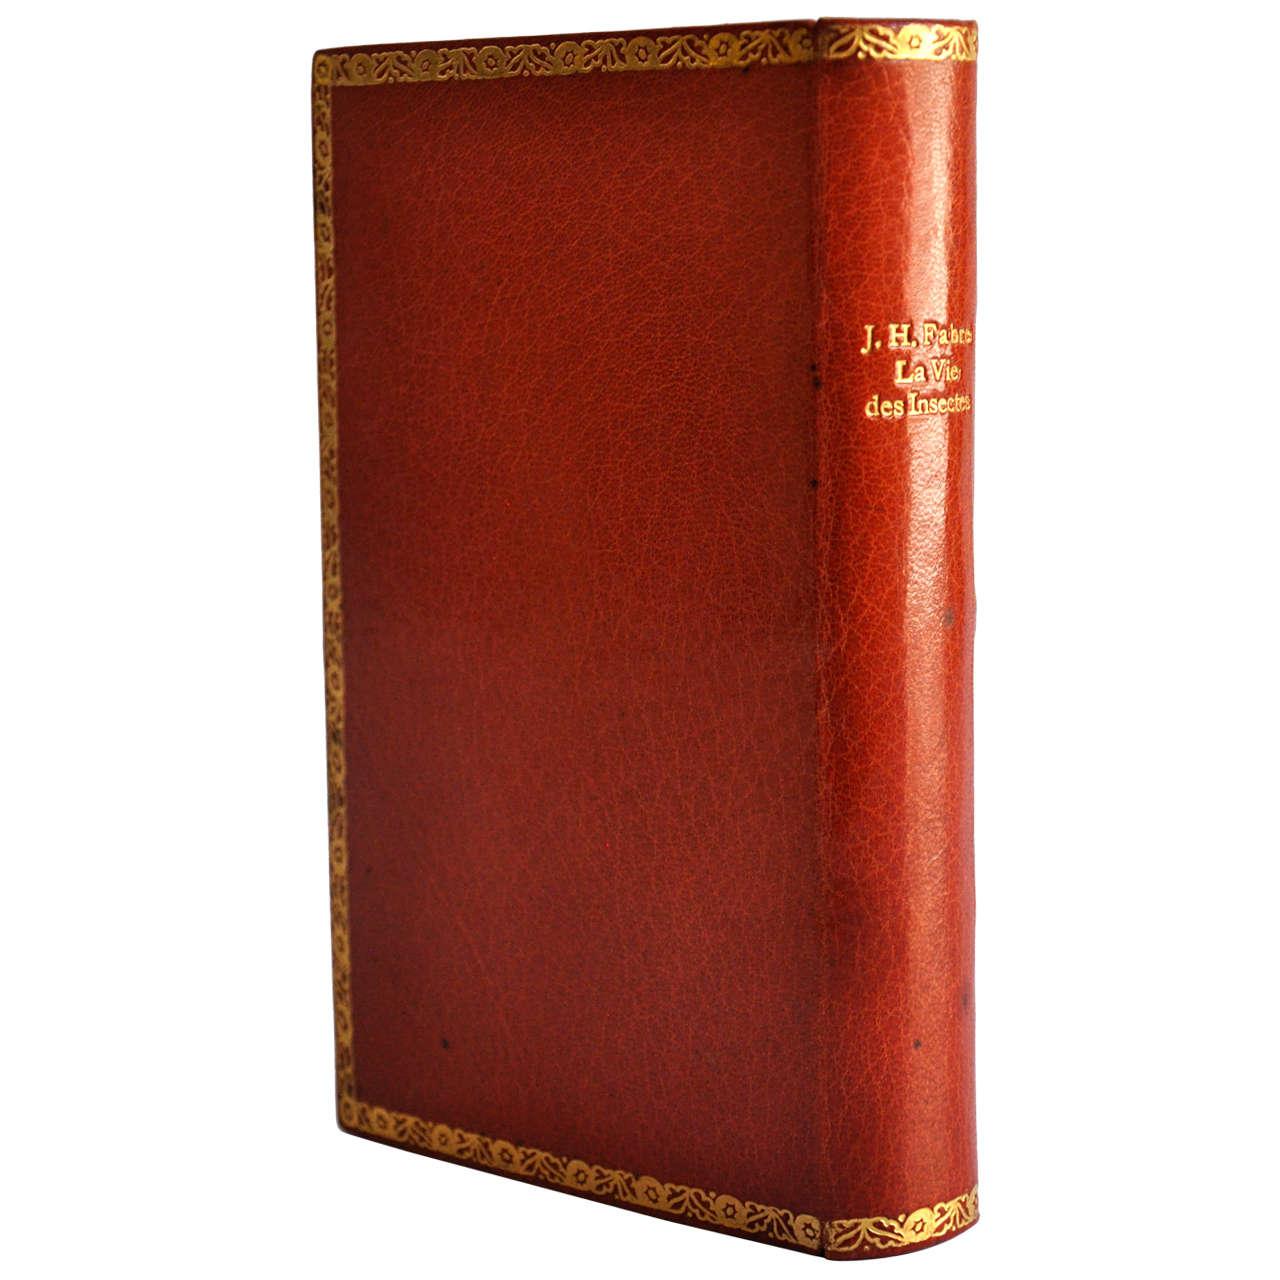 rare wiener werkstatte gilt leather book binding at 1stdibs